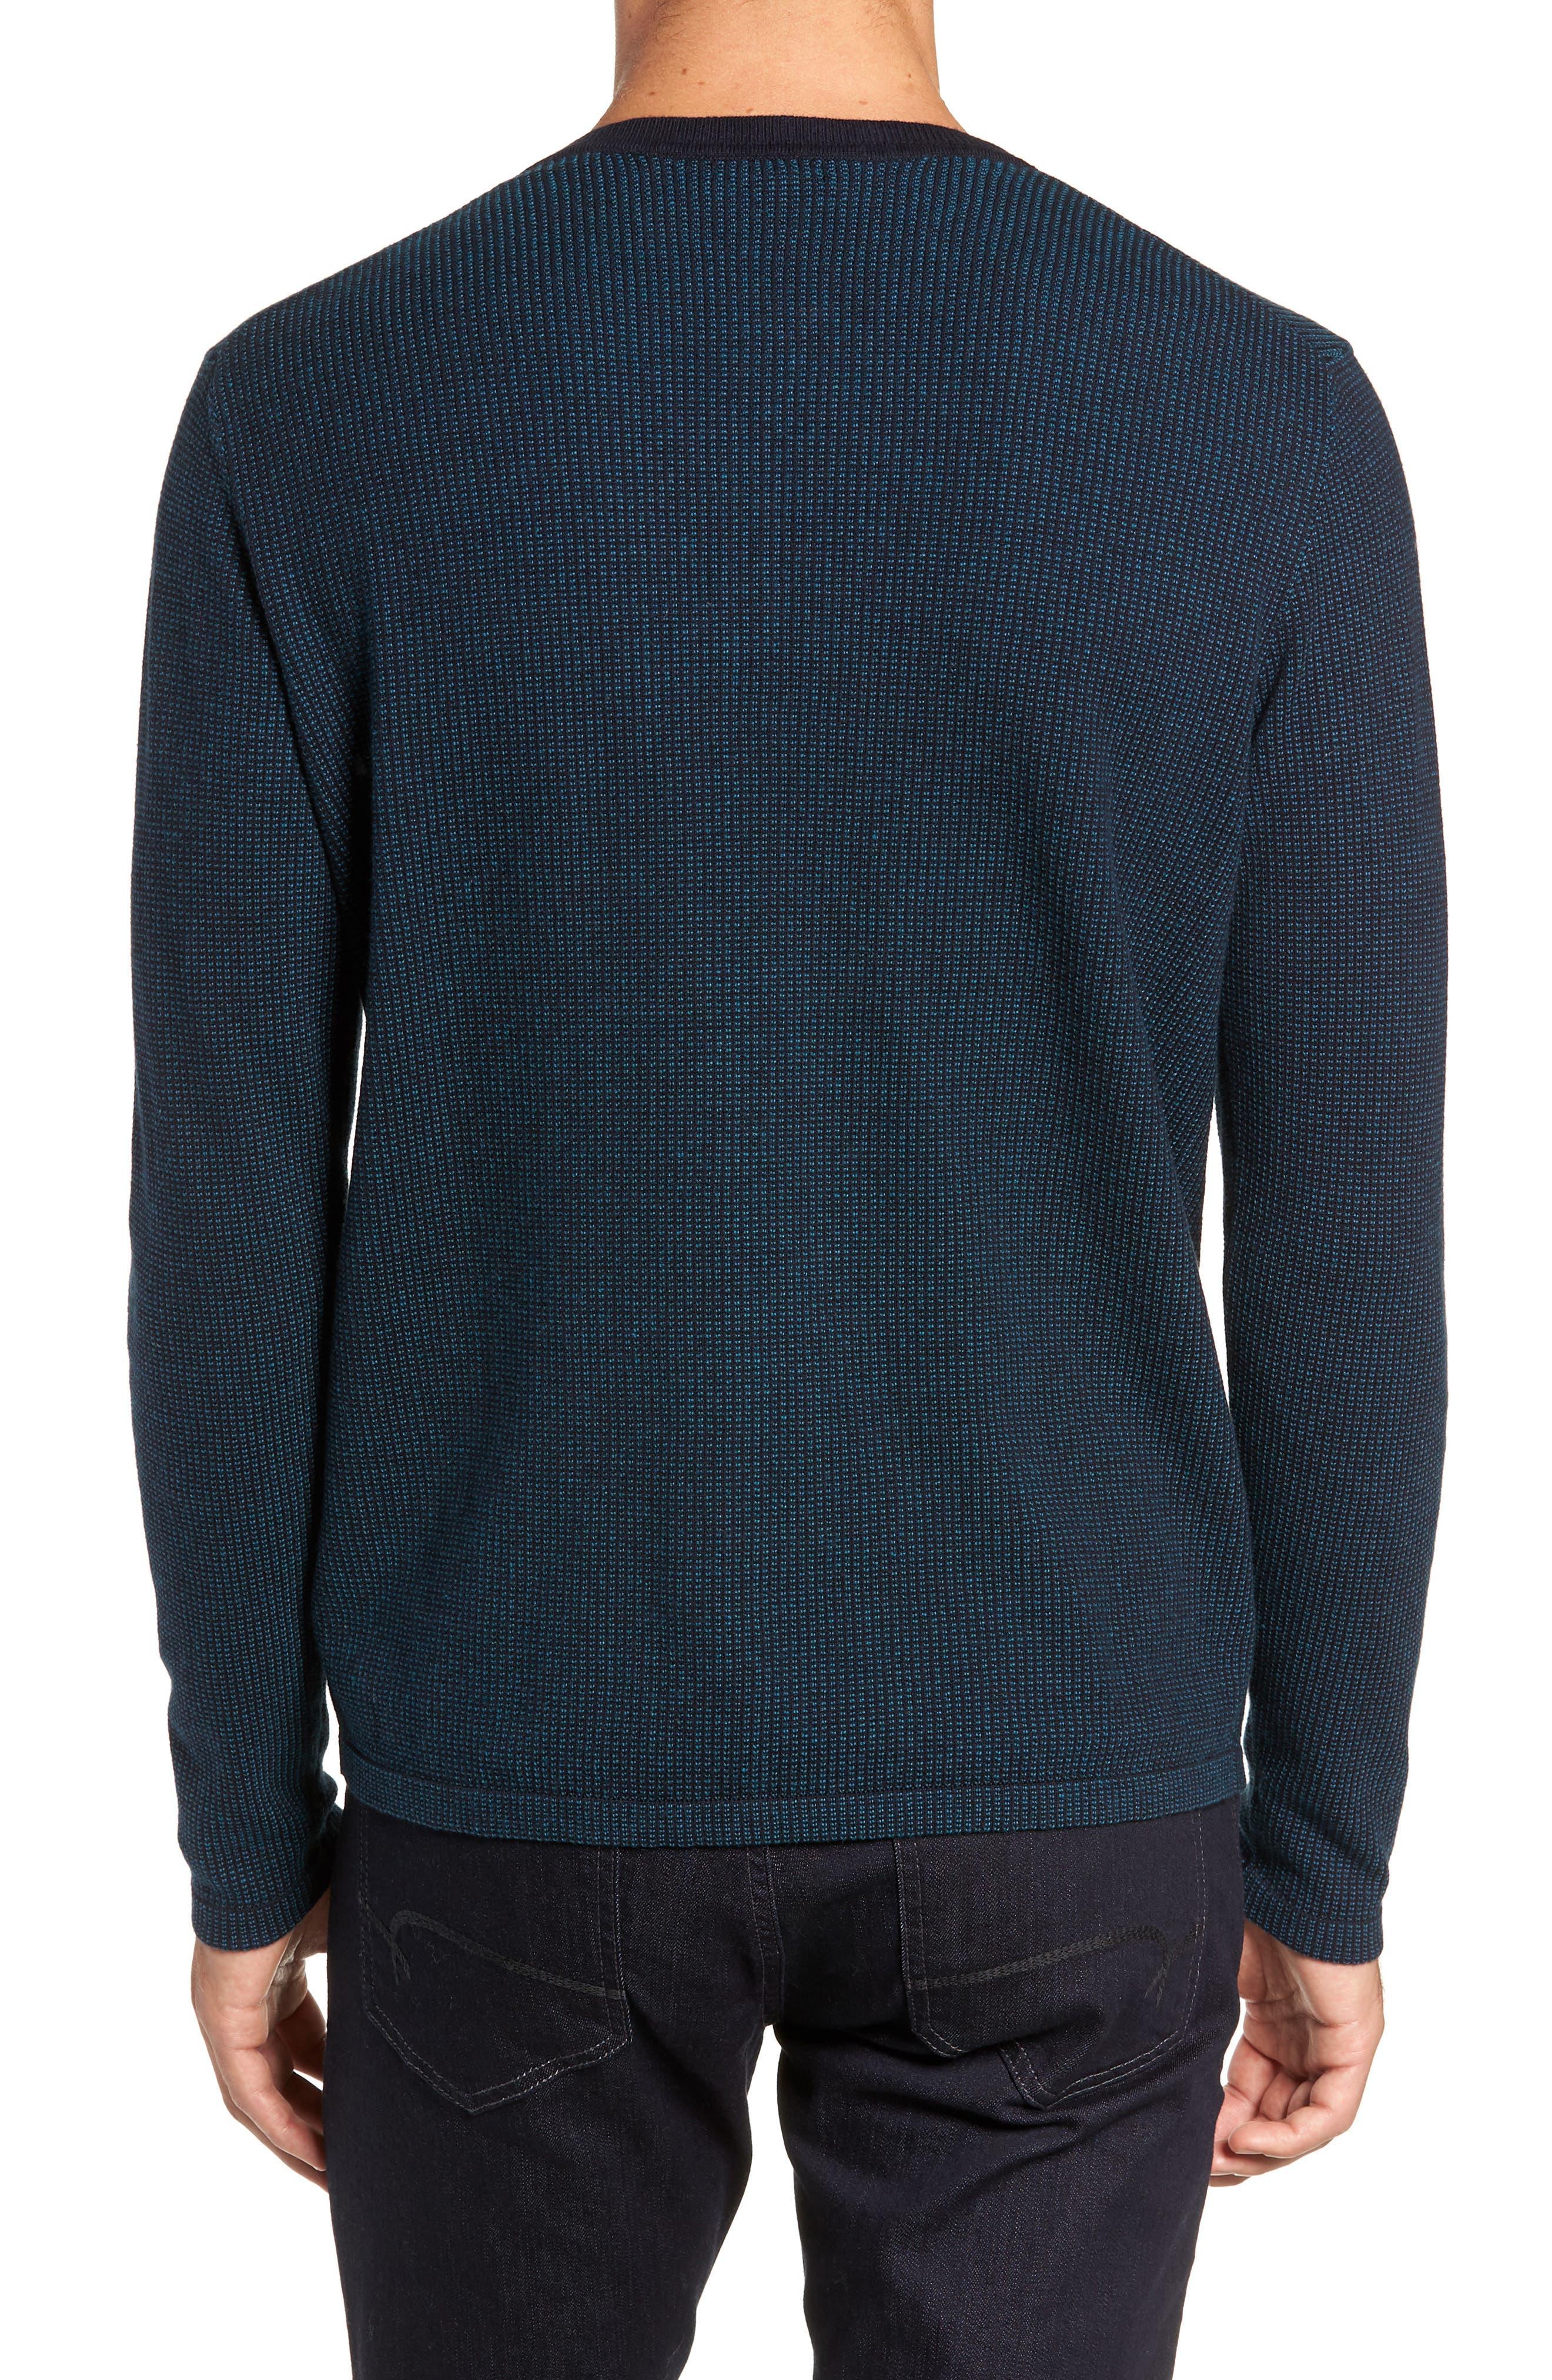 Kimball Henley Sweater,                             Alternate thumbnail 2, color,                             EMERALD